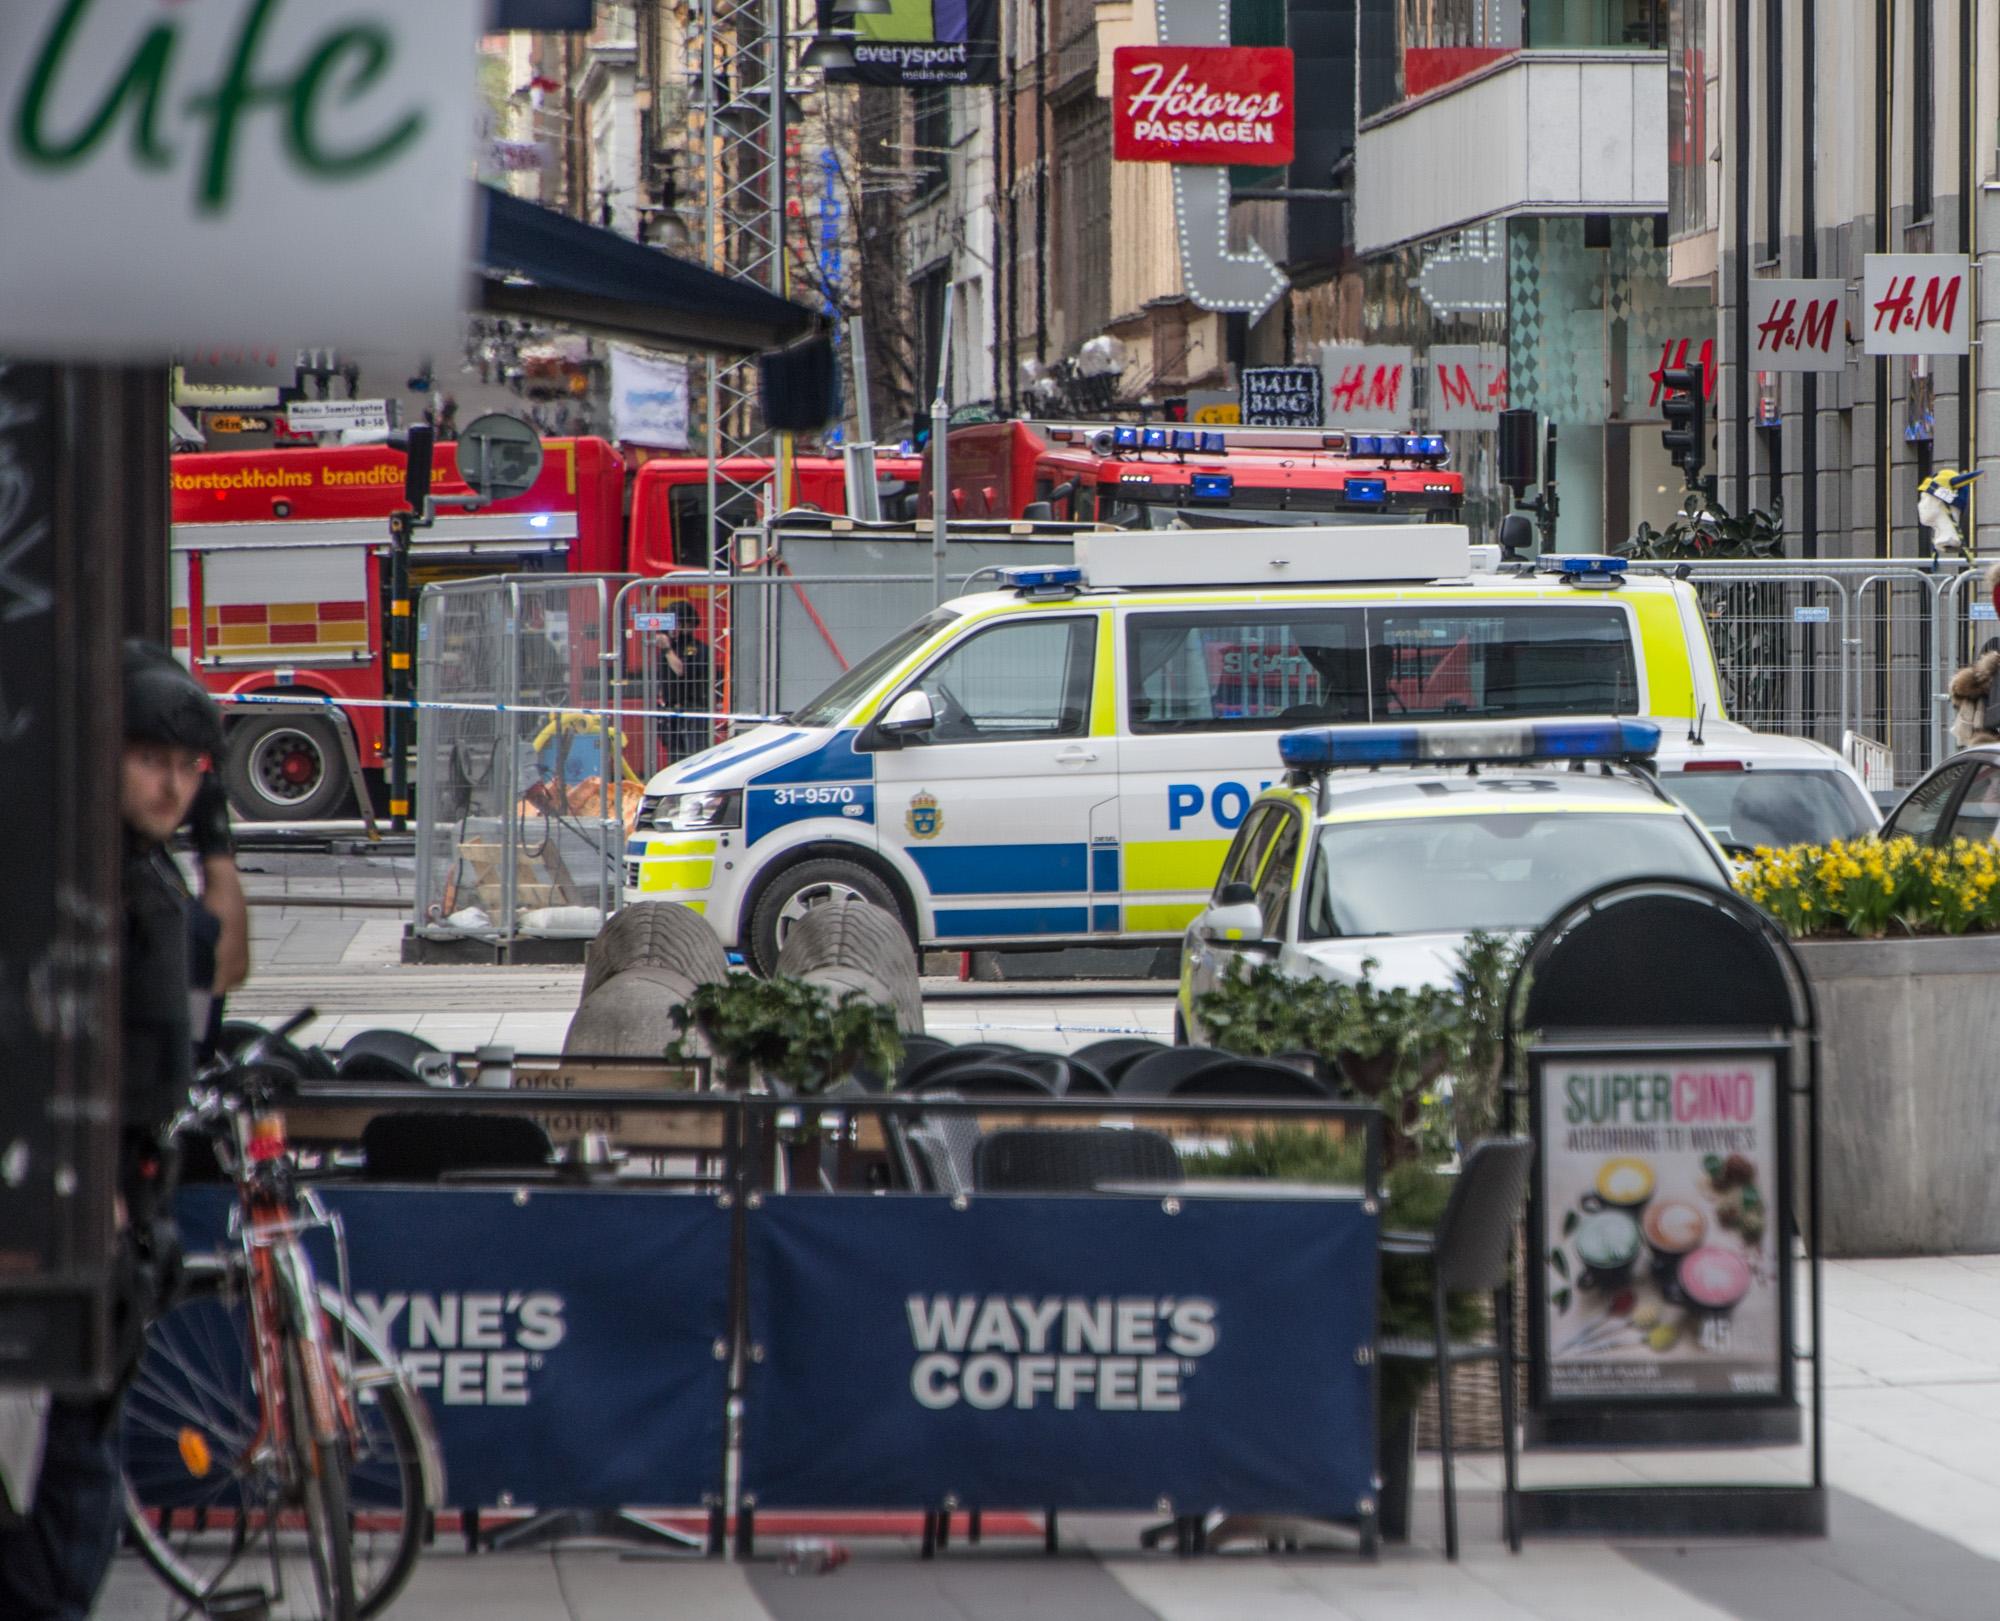 Angrebet I Stockholm 2017 Wikipedia Den Frie Encyklopaedi